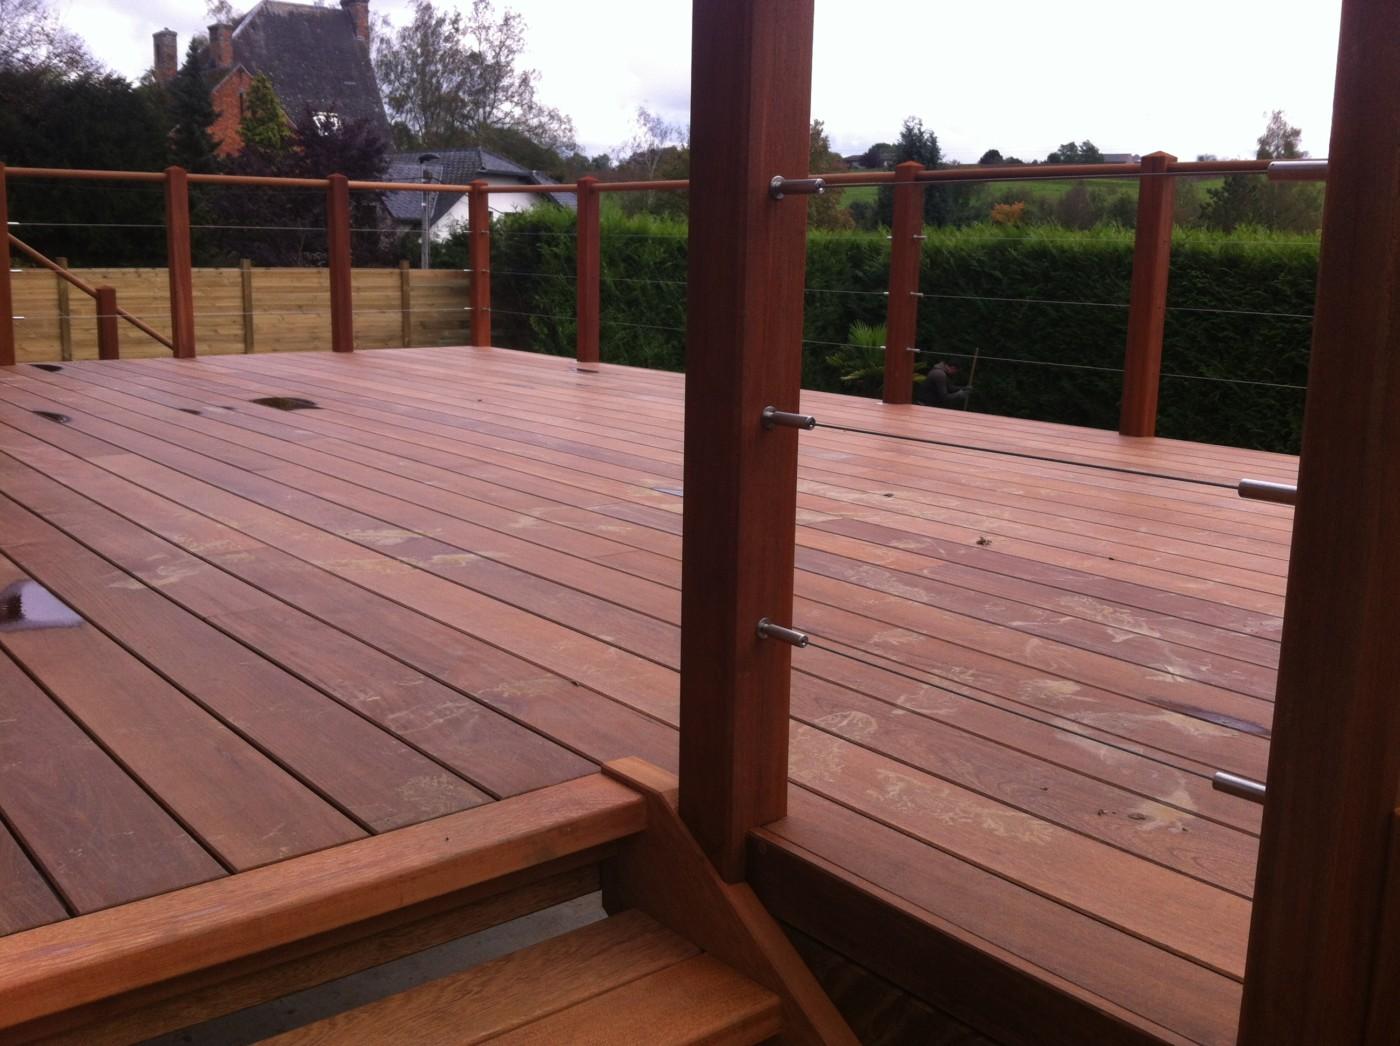 barriere terrasse bois garde corp bois exterieur images. Black Bedroom Furniture Sets. Home Design Ideas